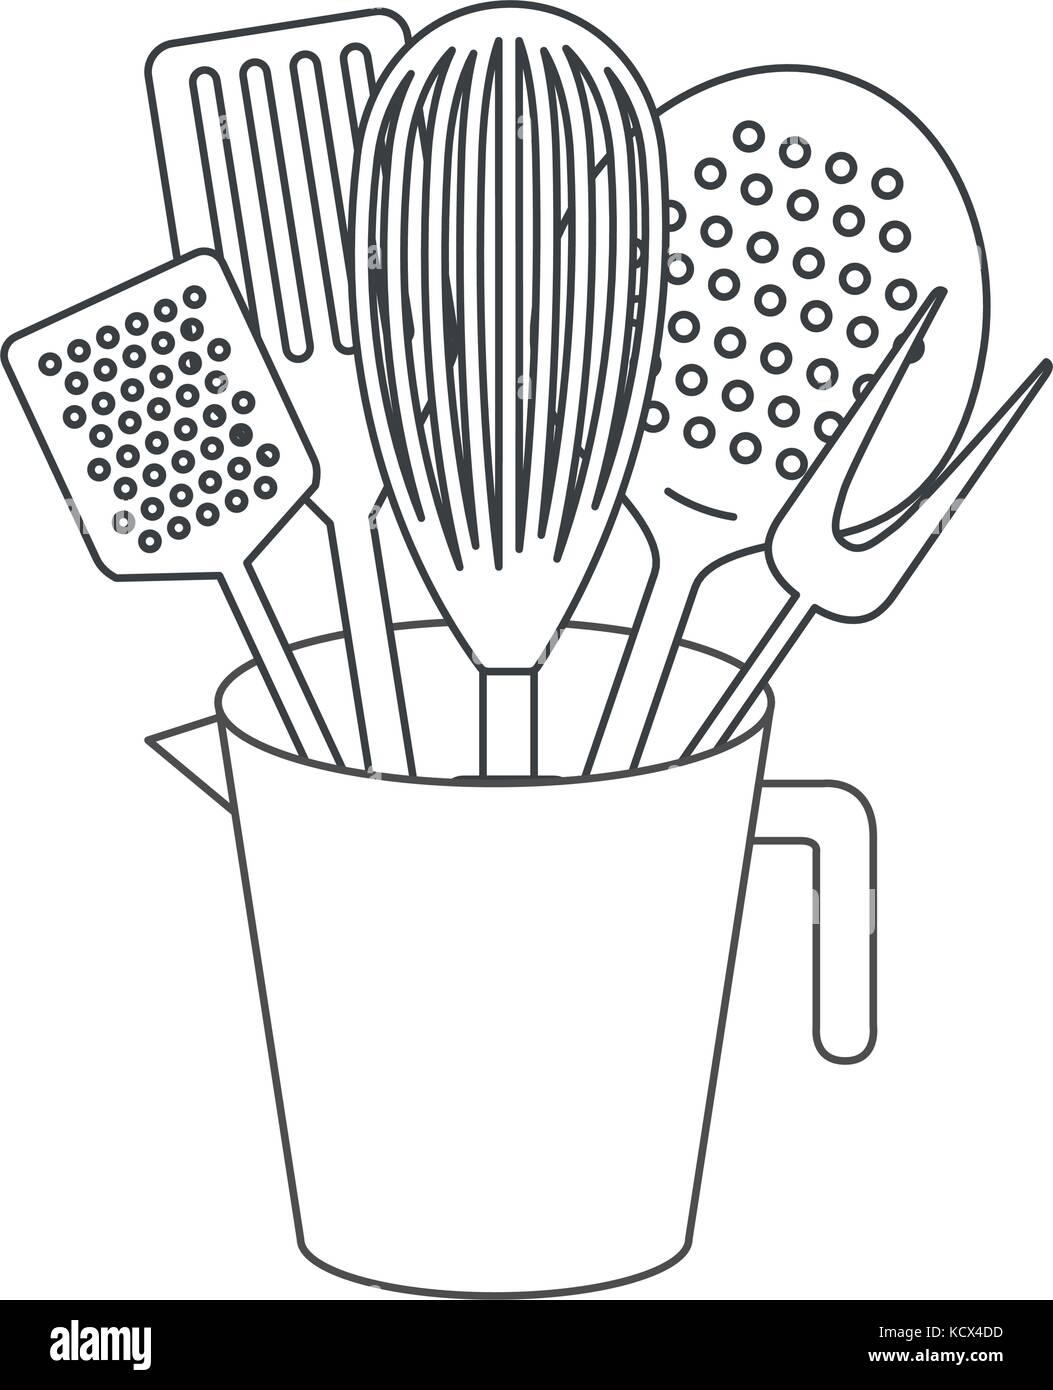 jar with kitchen utensils monochrome silhouette - Stock Vector